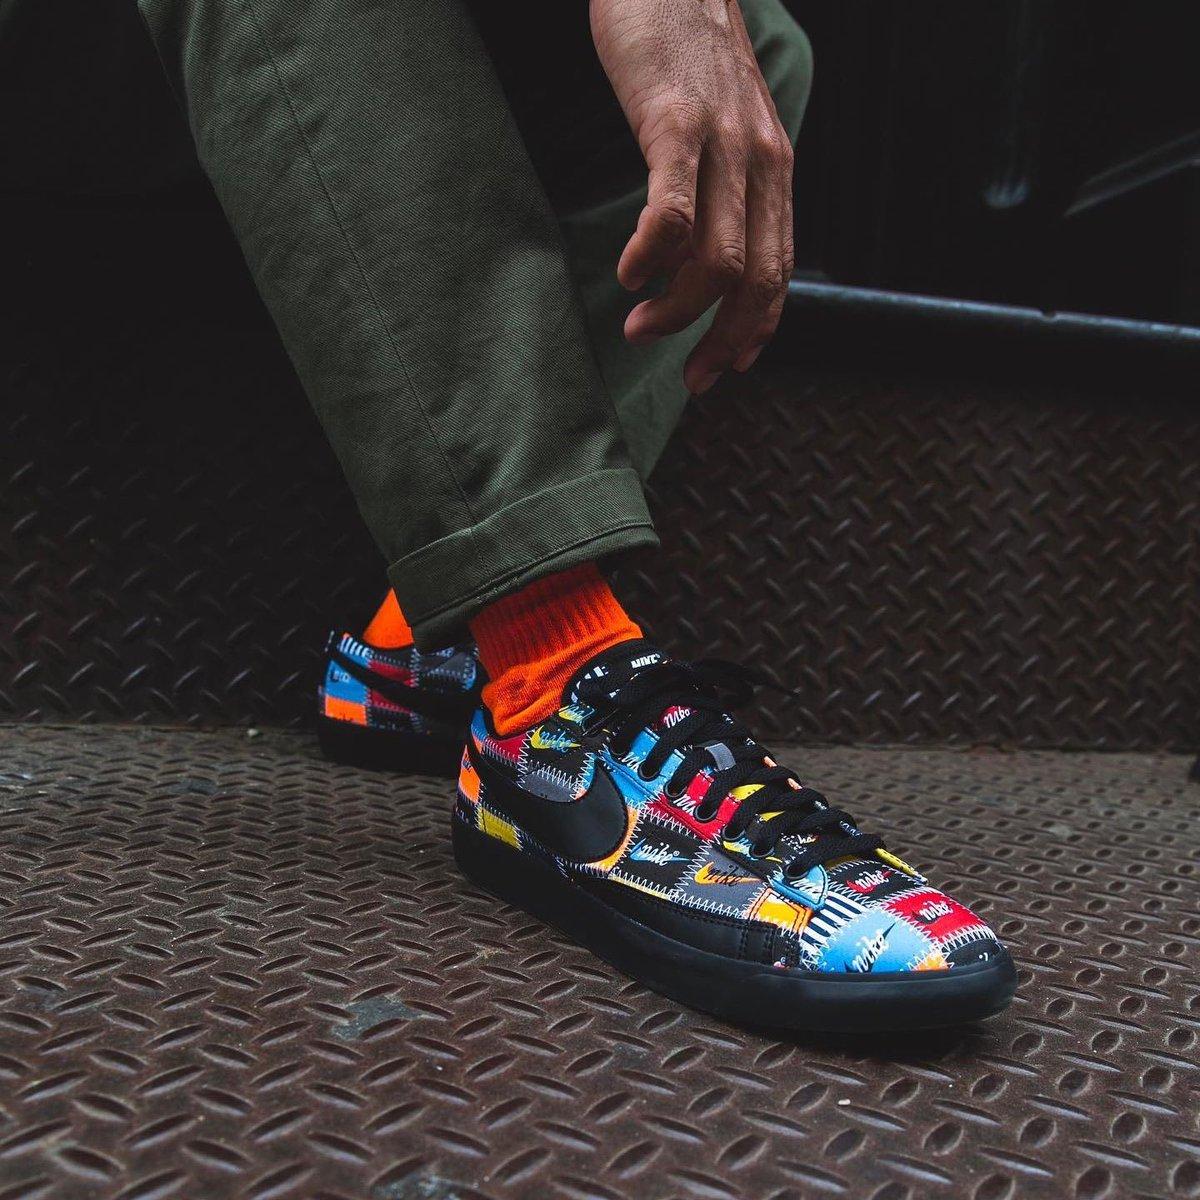 UNDER RETAIL Nike Blazer Low 'Patchwork